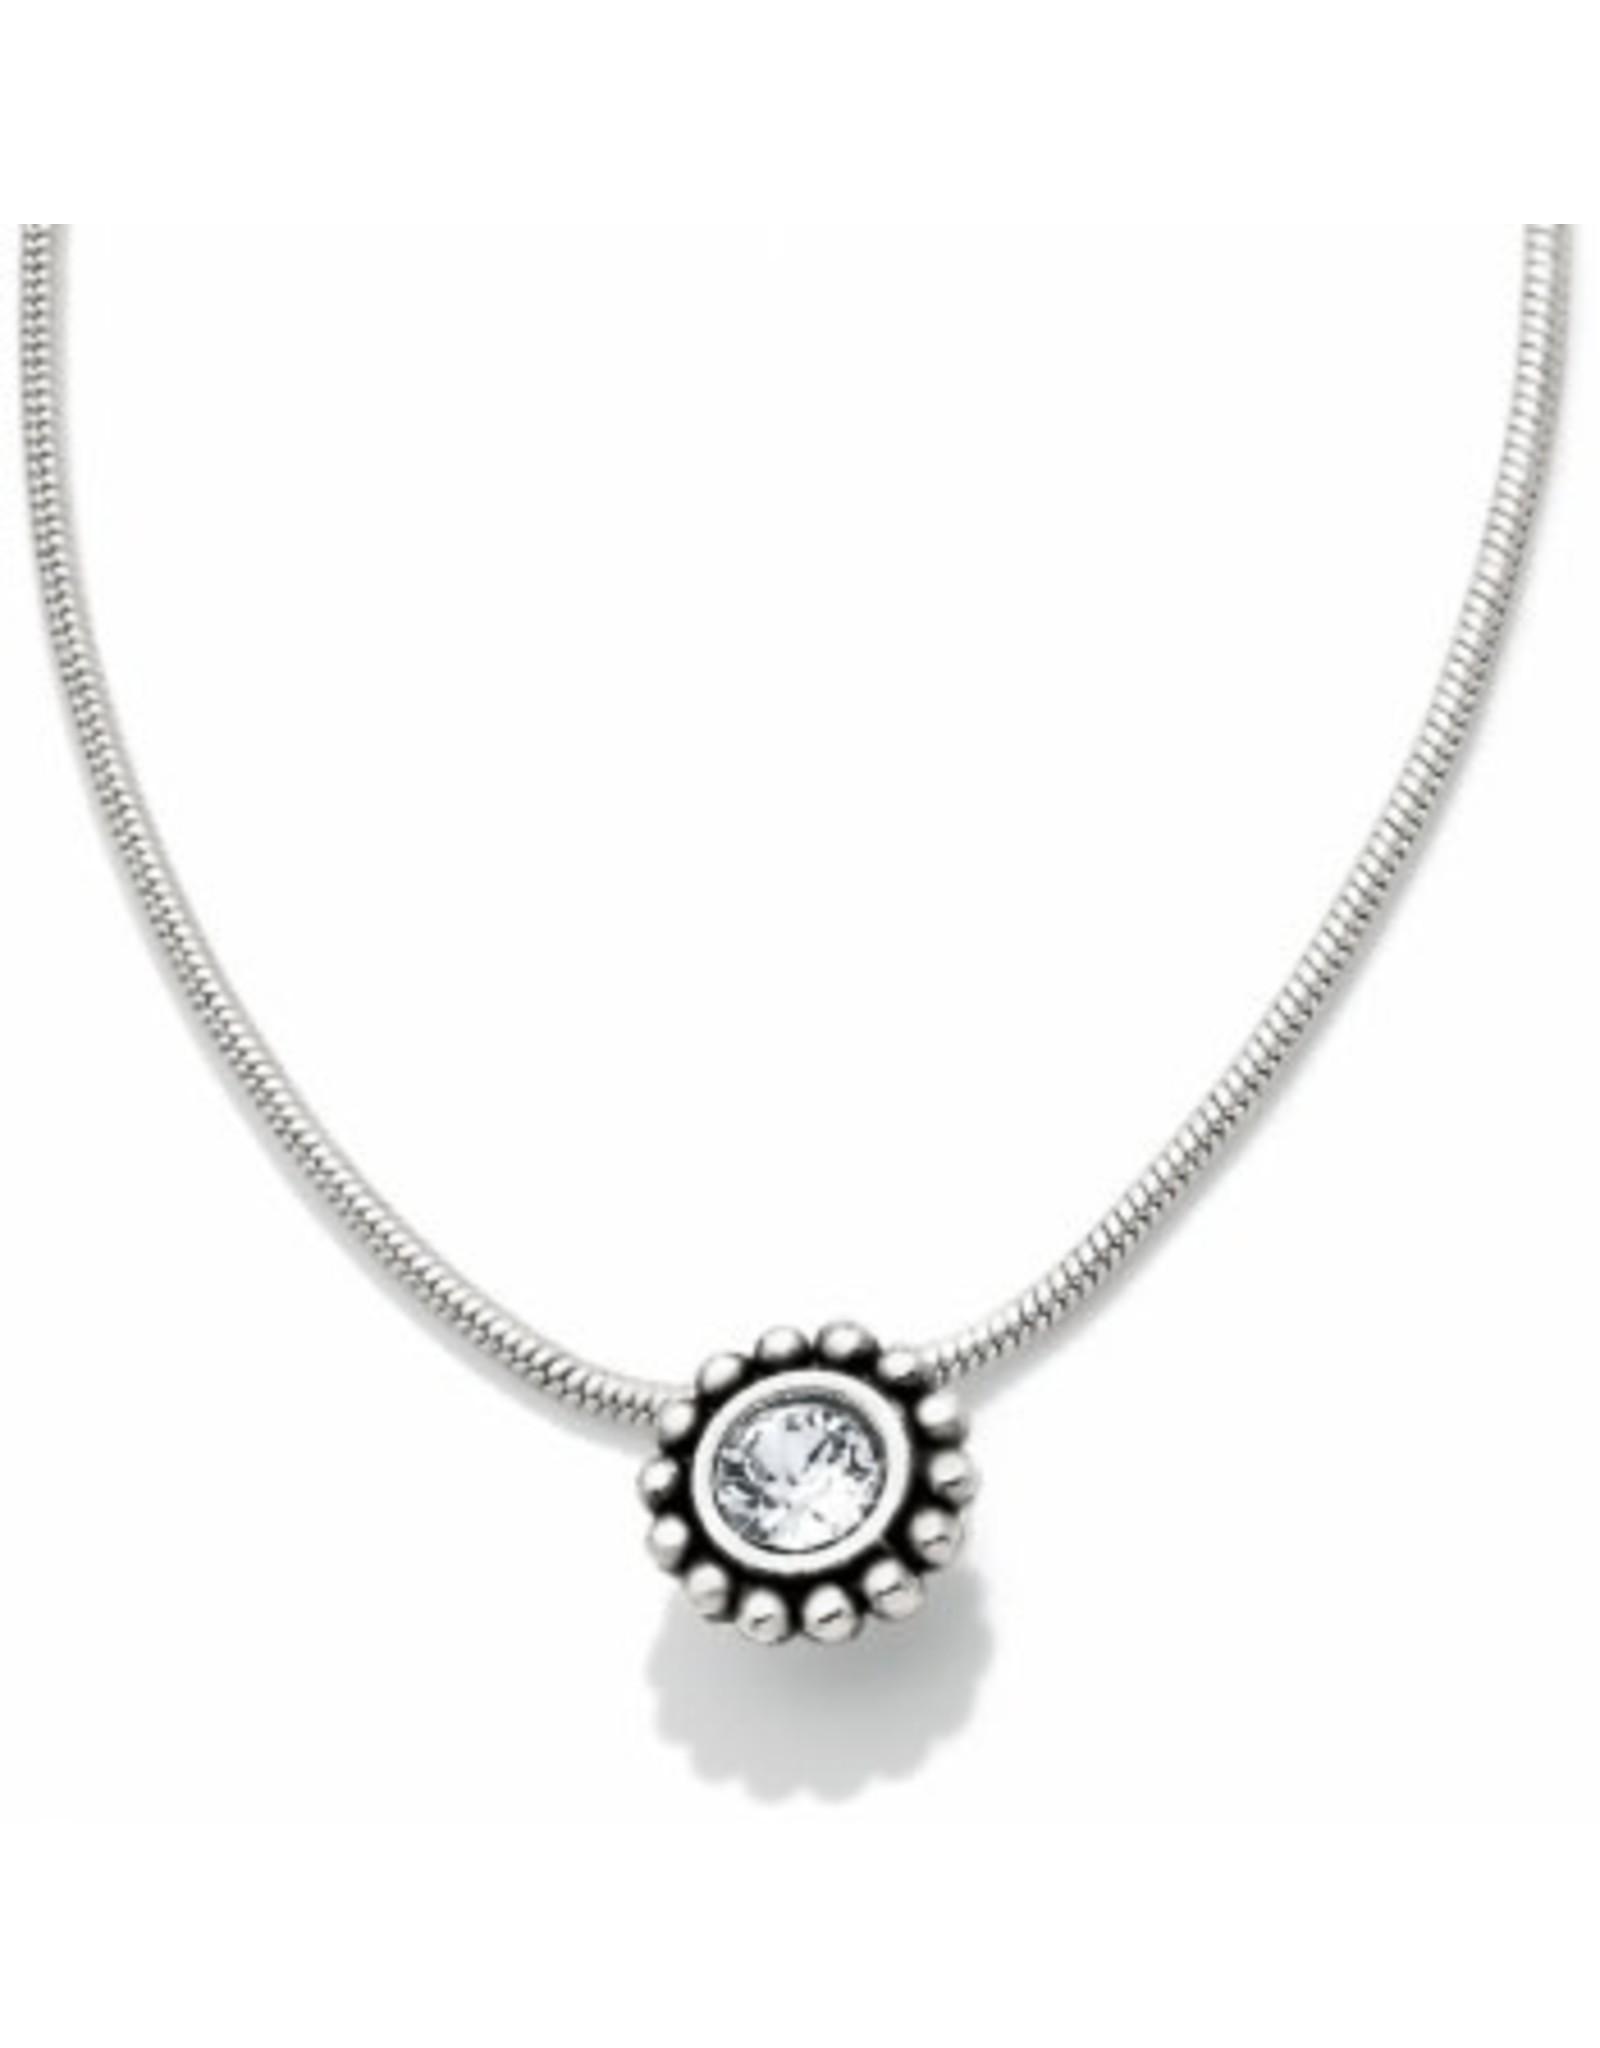 Brighton Twinkle Petite Necklace